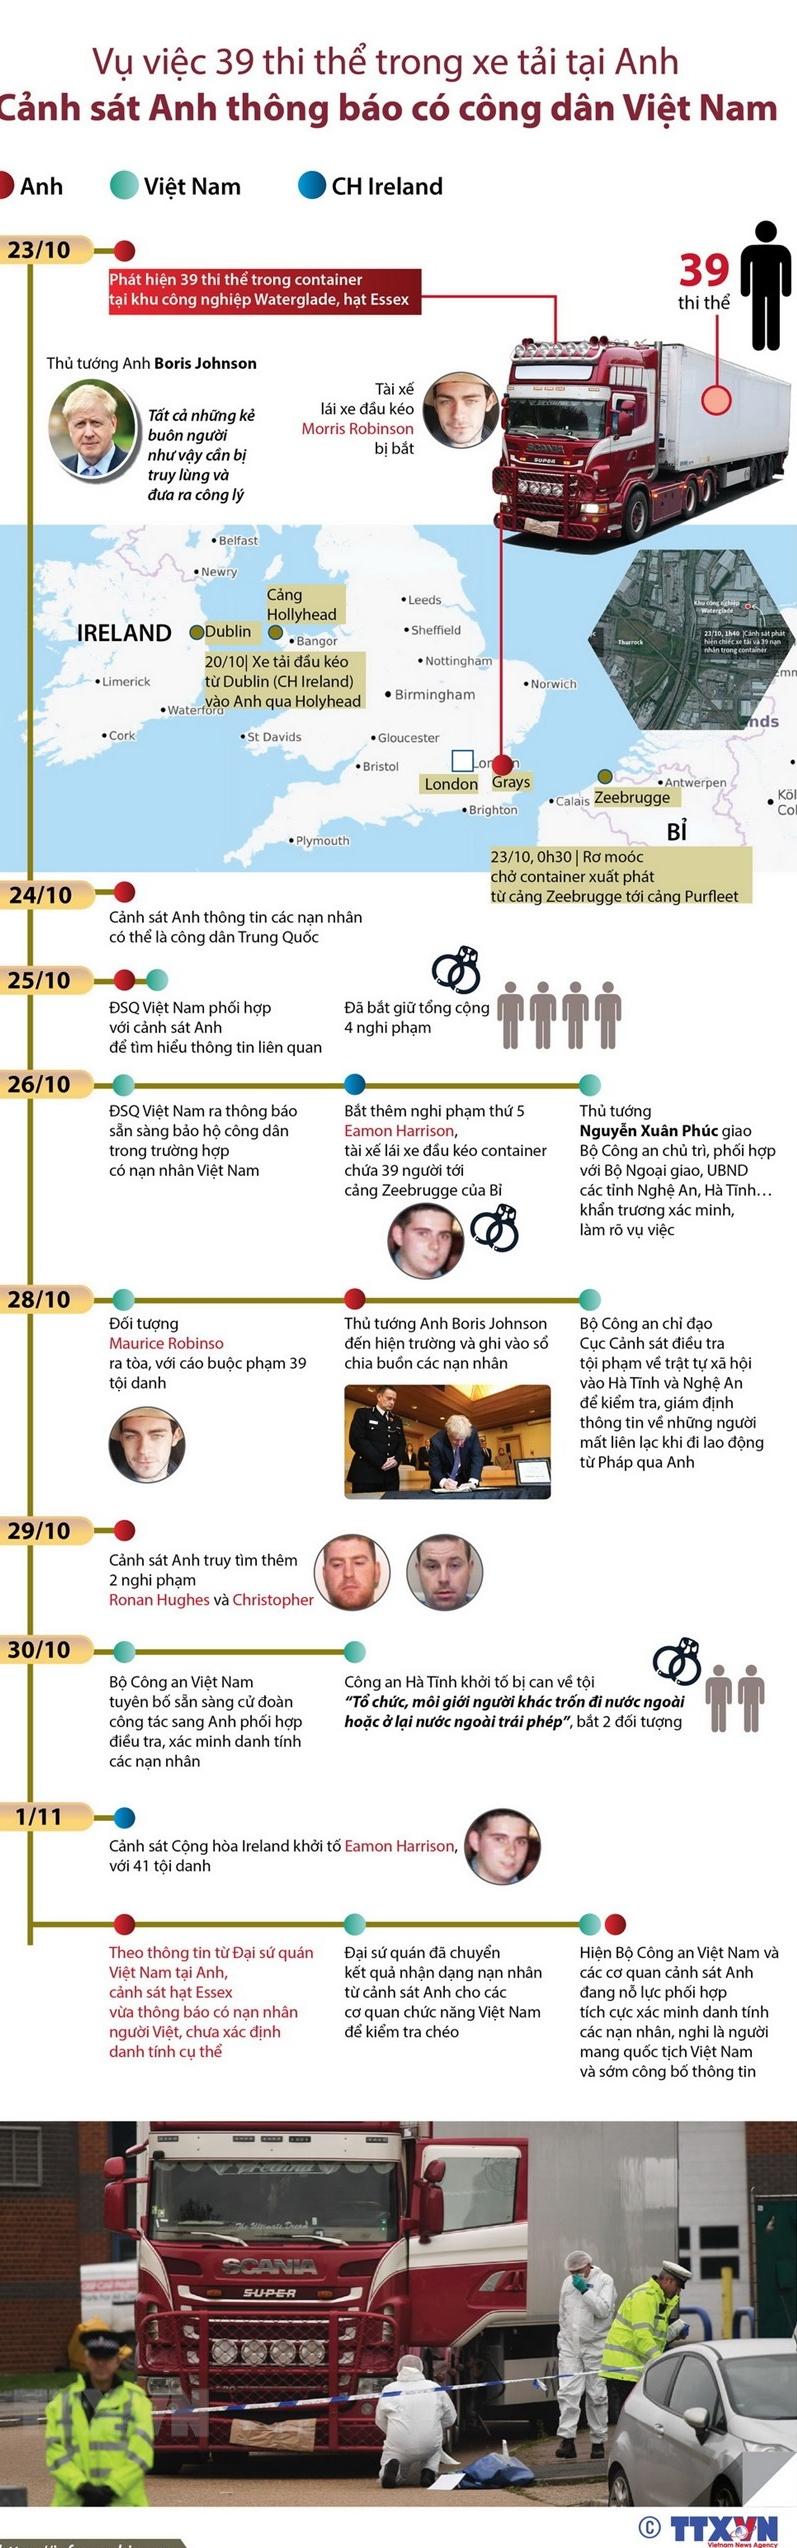 infographics toan canh vu 39 thi the trong xe tai o anh